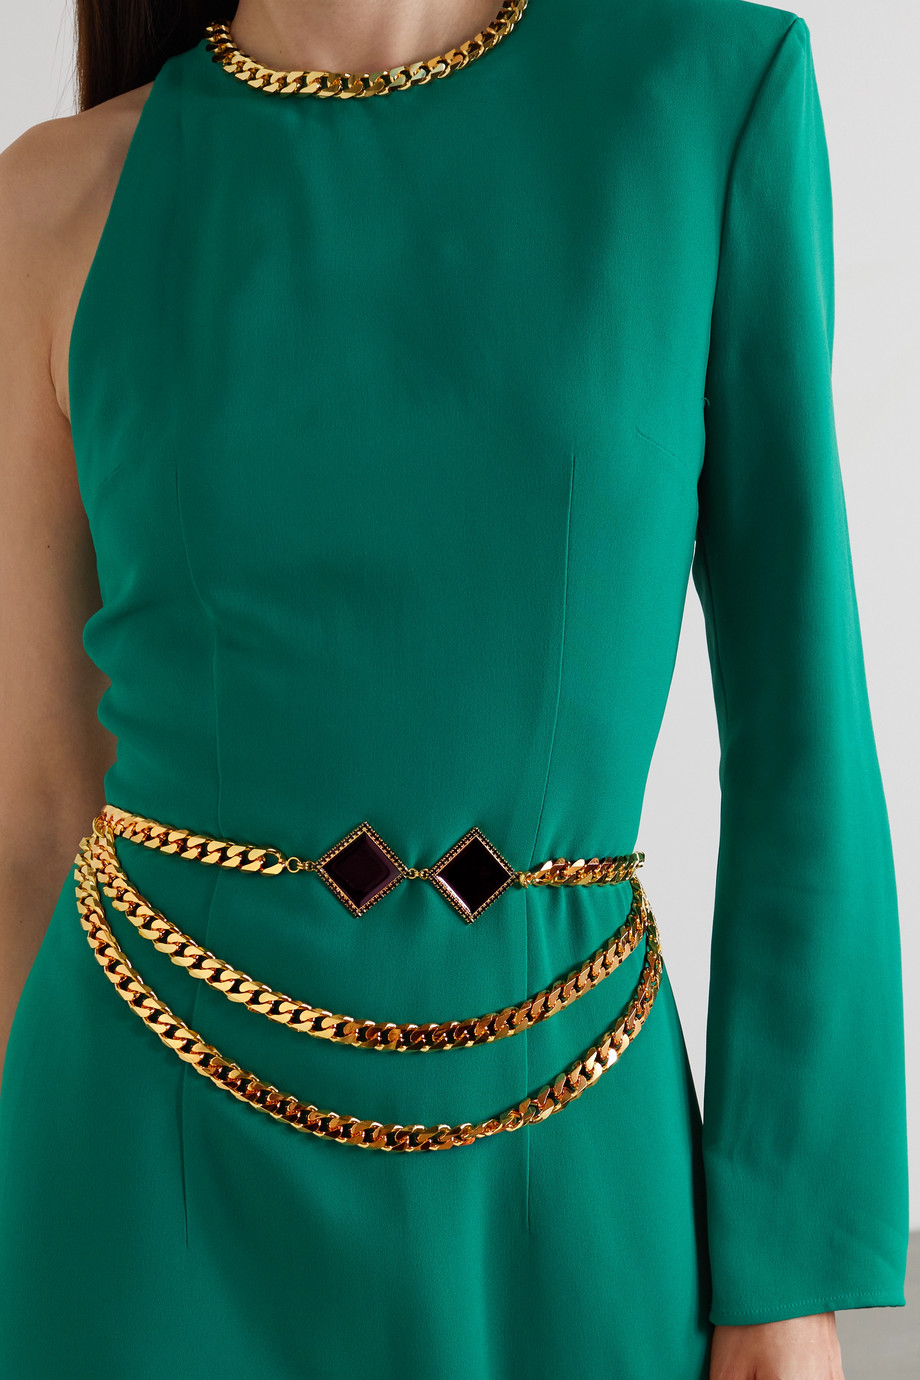 Rowen Rose Gold-tone and enamel belt